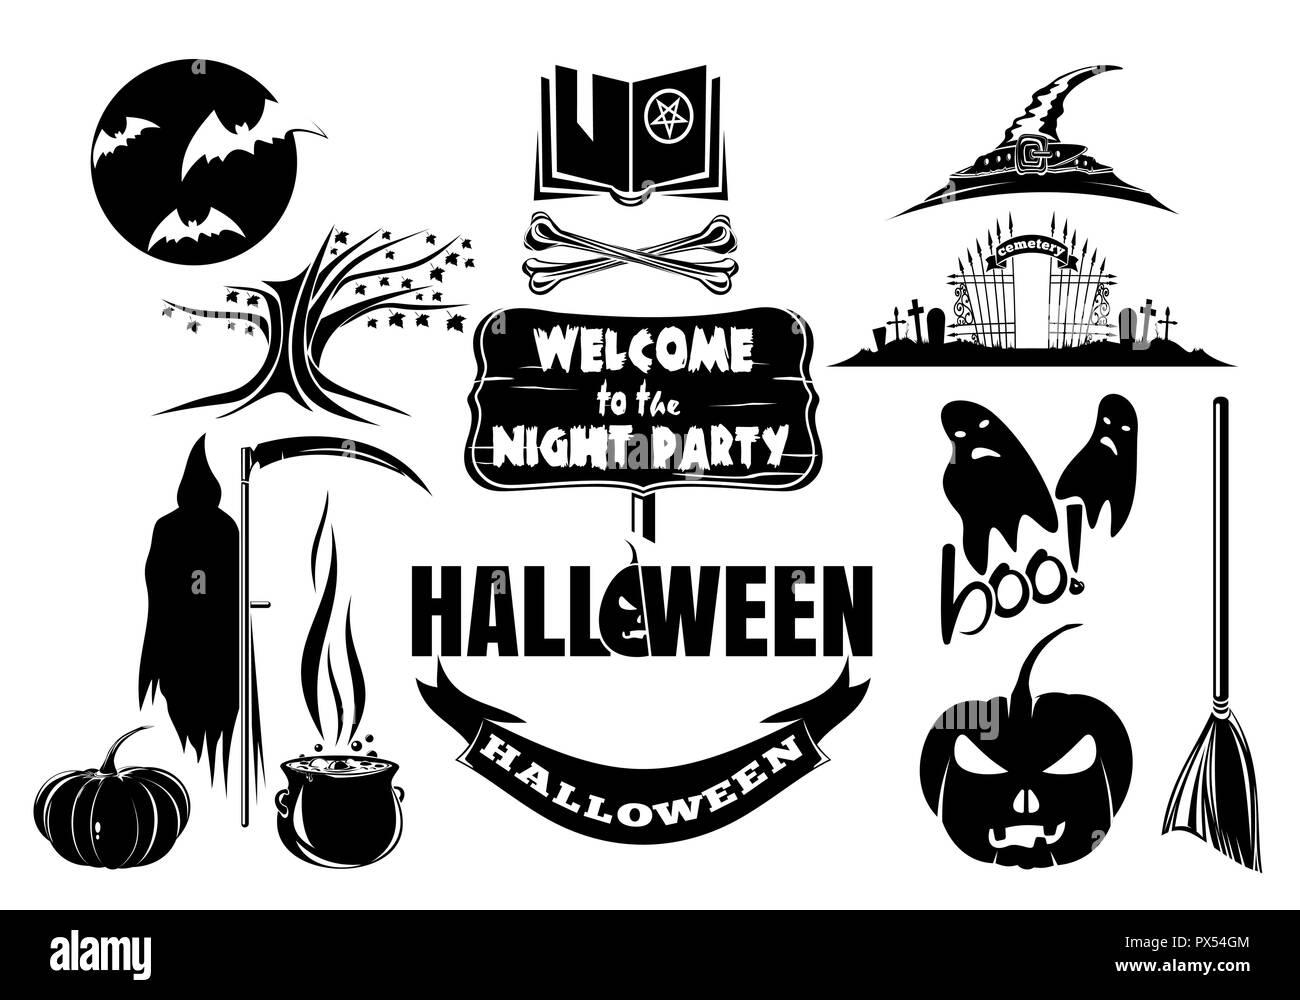 Vector black and white Halloween icon set - Stock Image